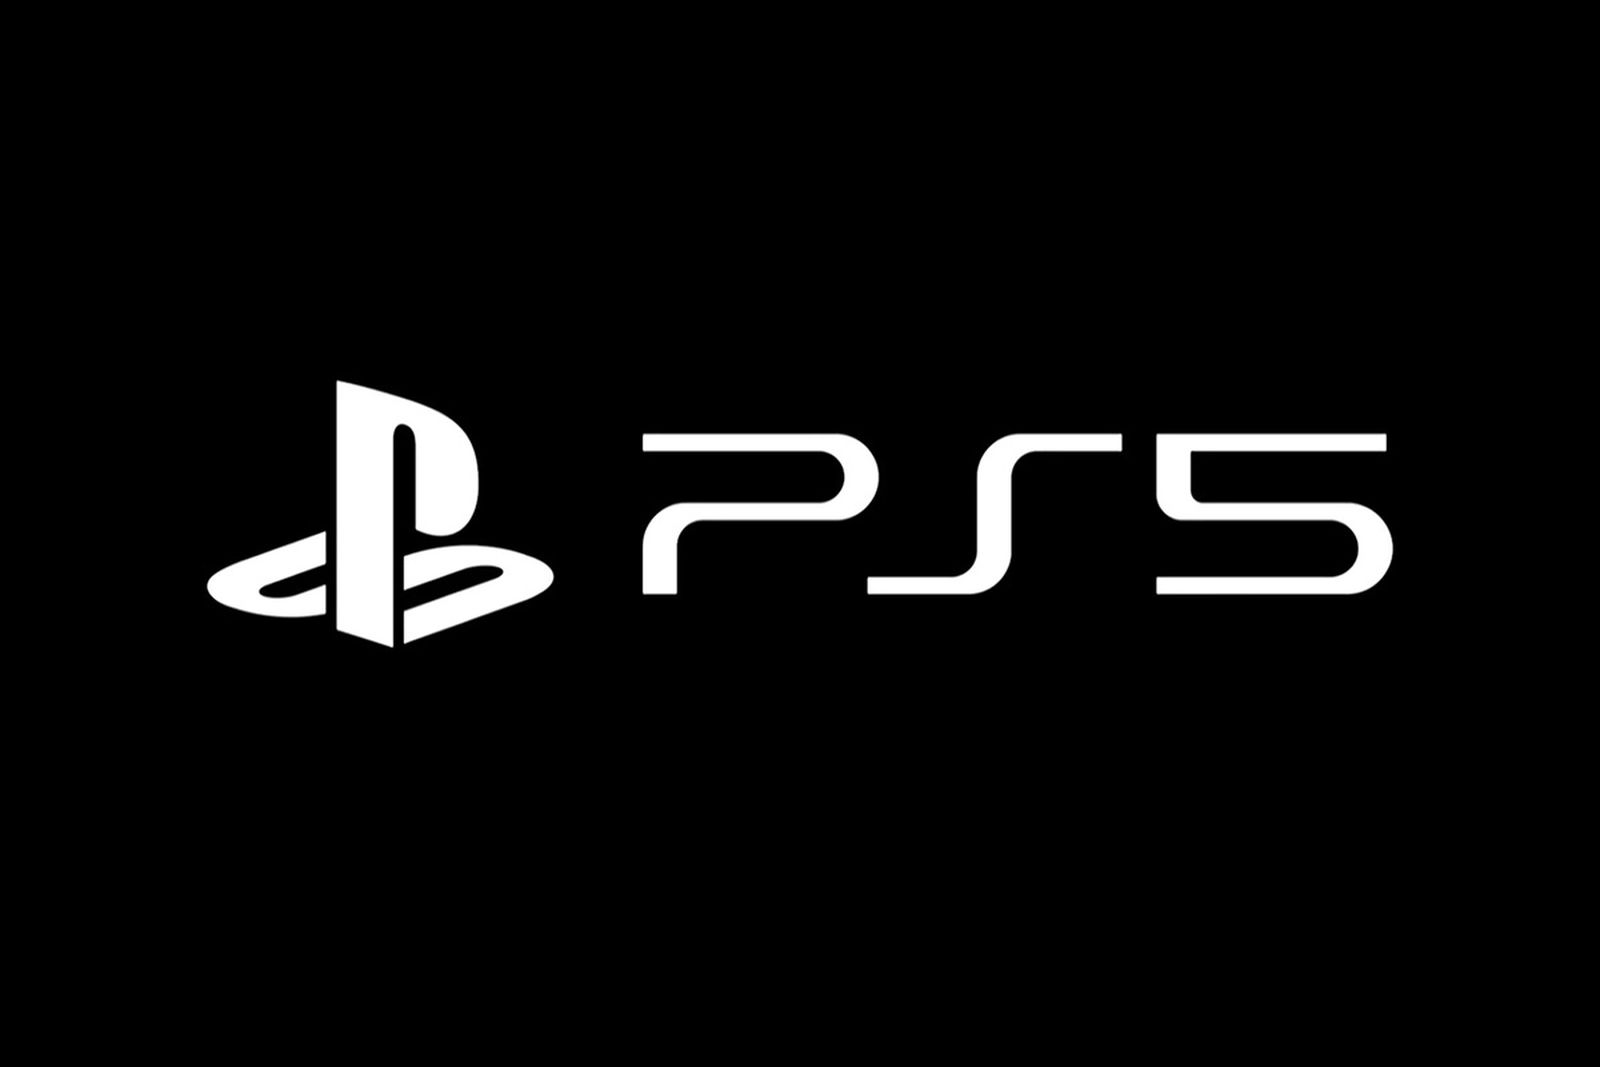 playstation-5-logo-main